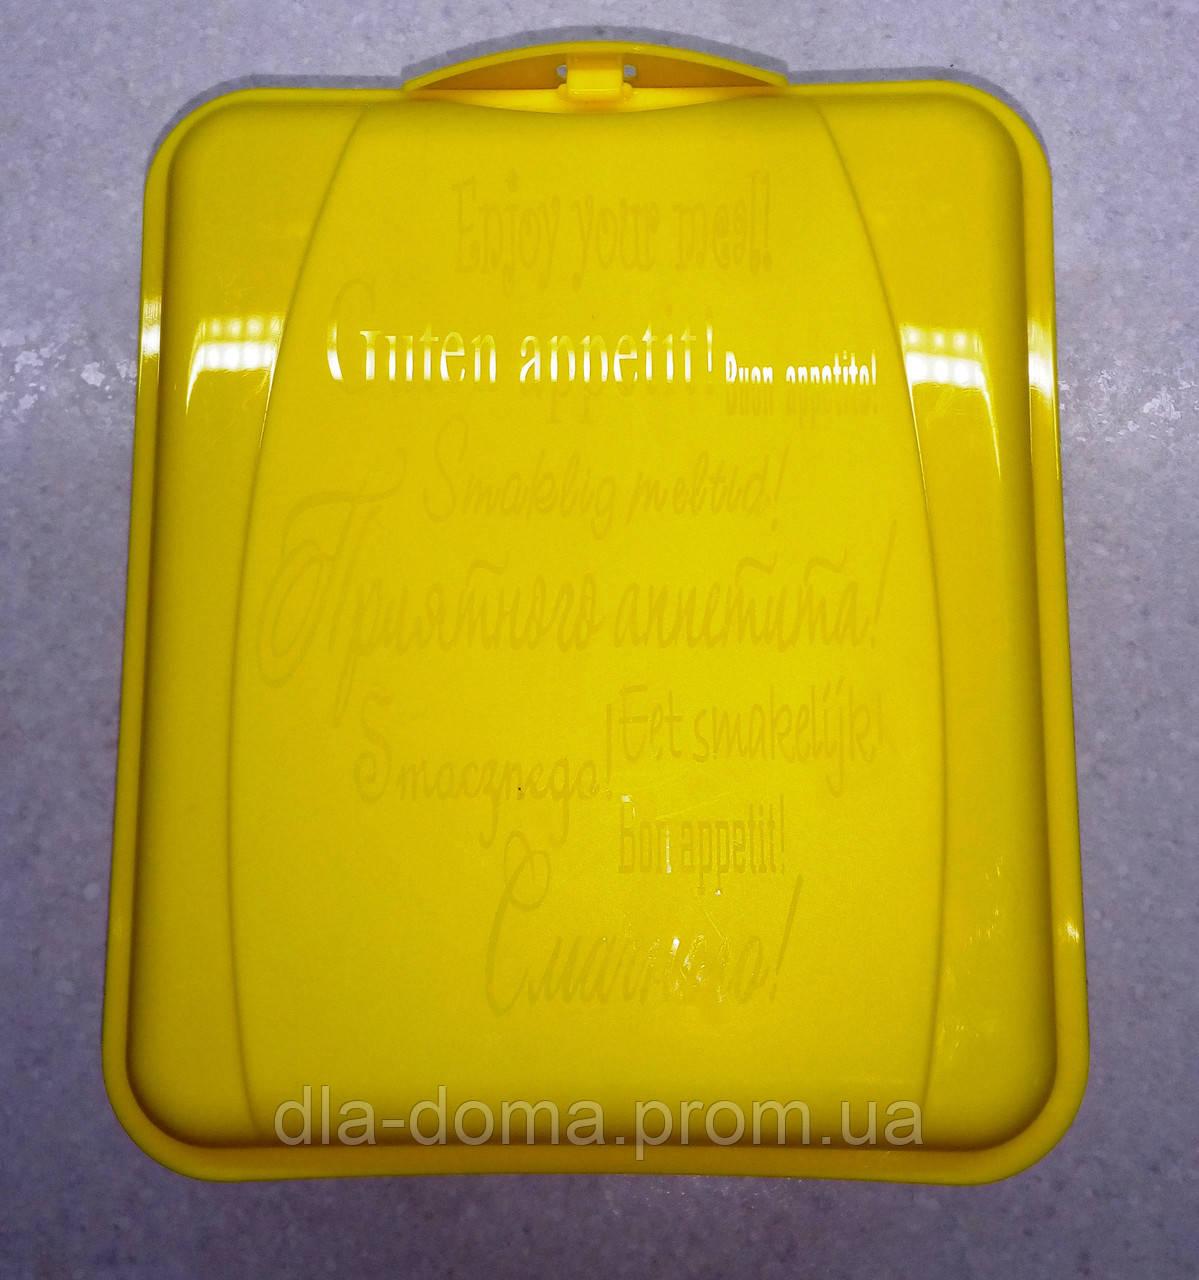 Ланч-бокс (13,5 x 16 x 6,5 см.) желтый